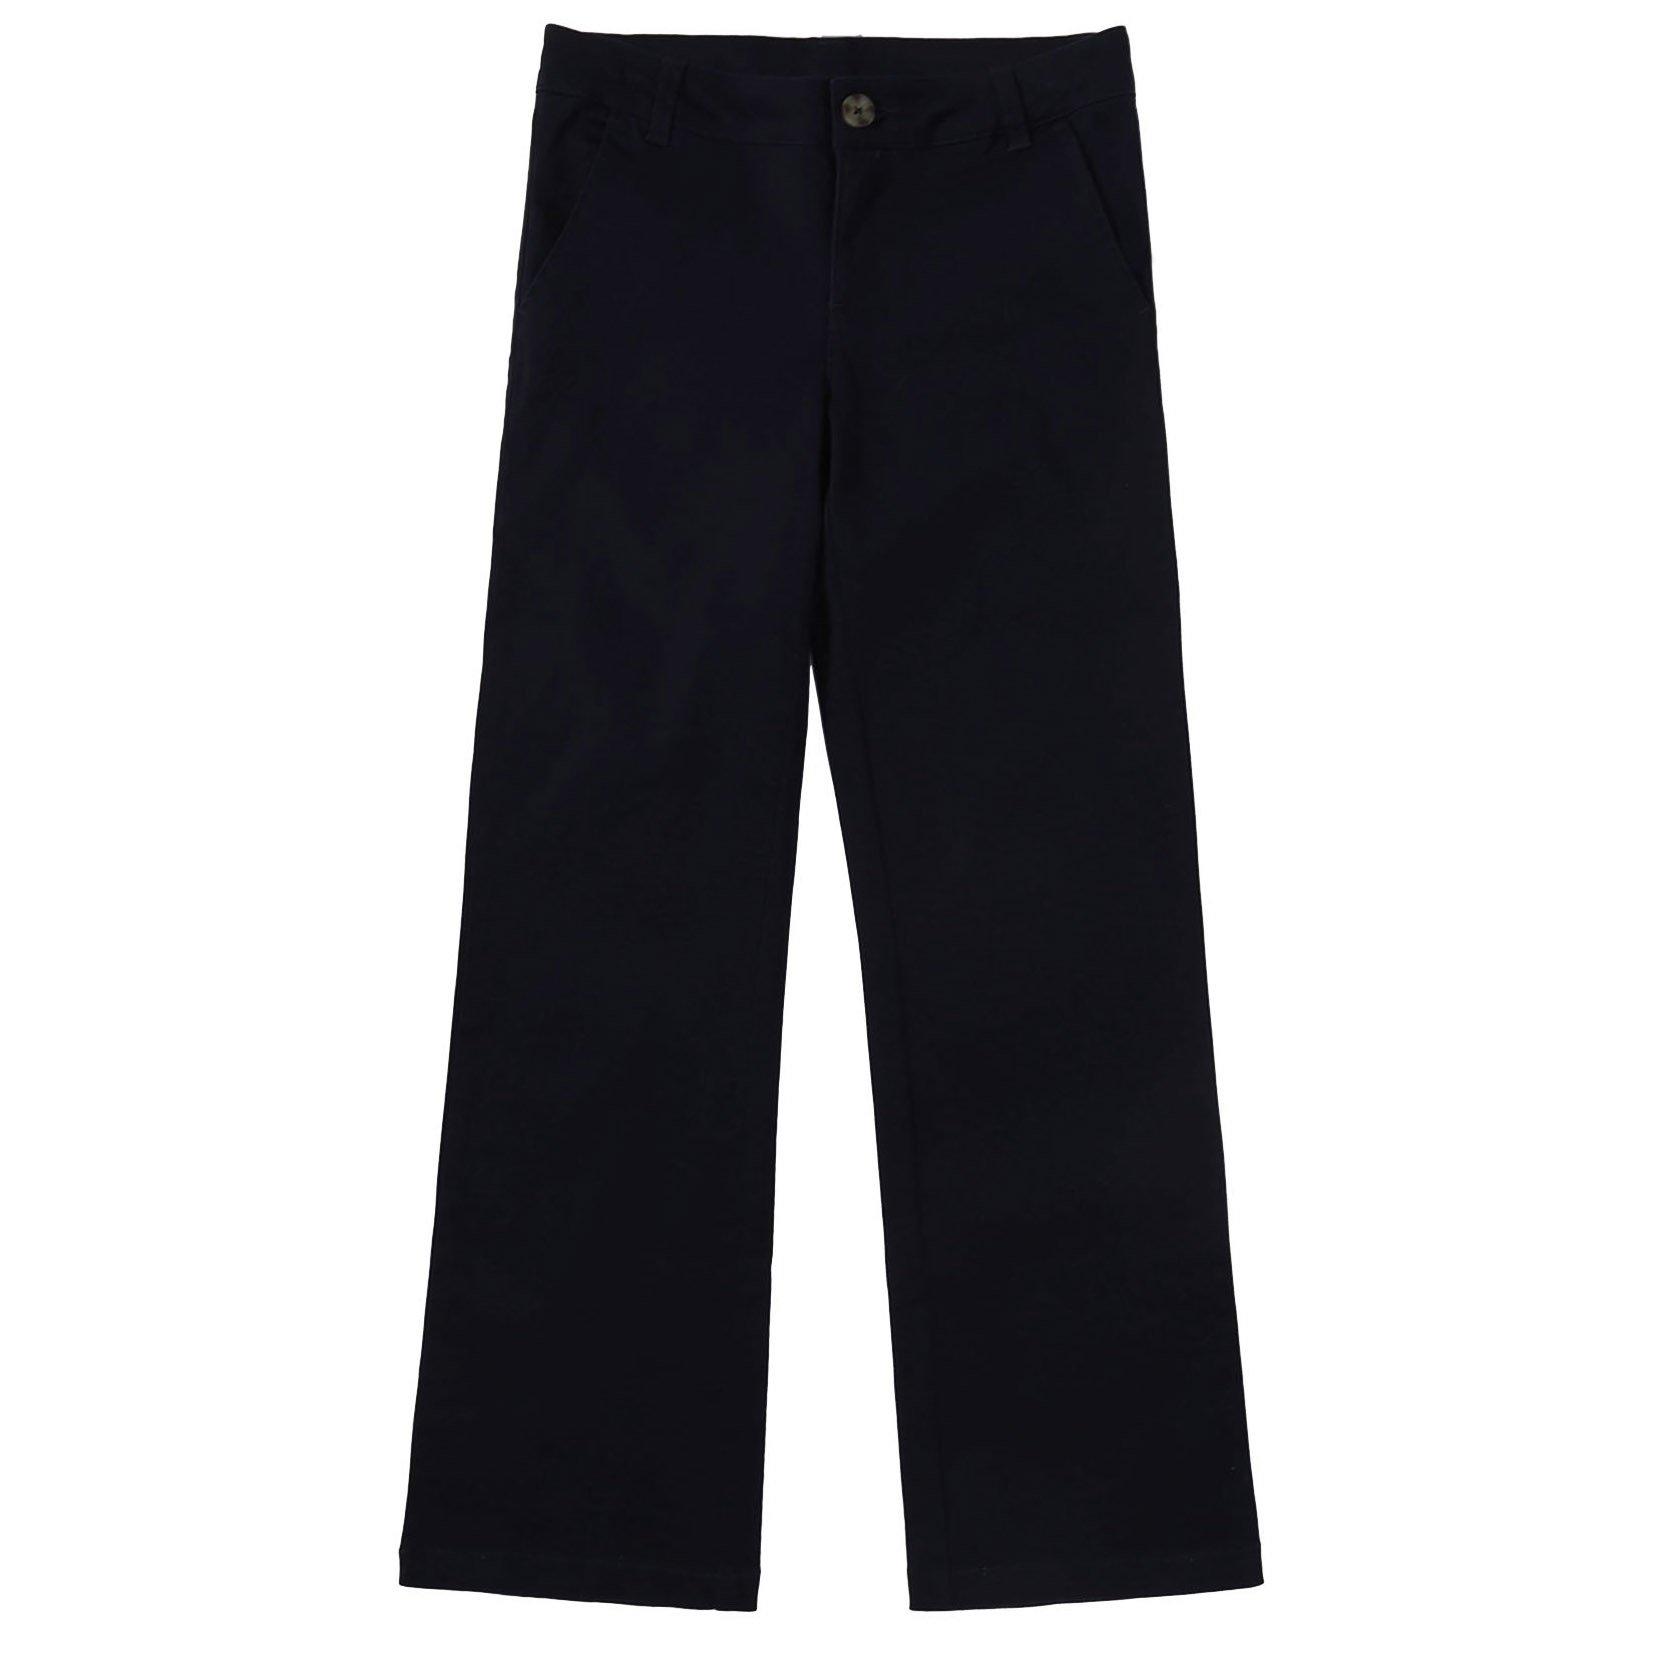 Bienzoe Girl's School Uniforms Cotton Stretchy Twill Adjust Waist Flat Front Pants Black Size 4